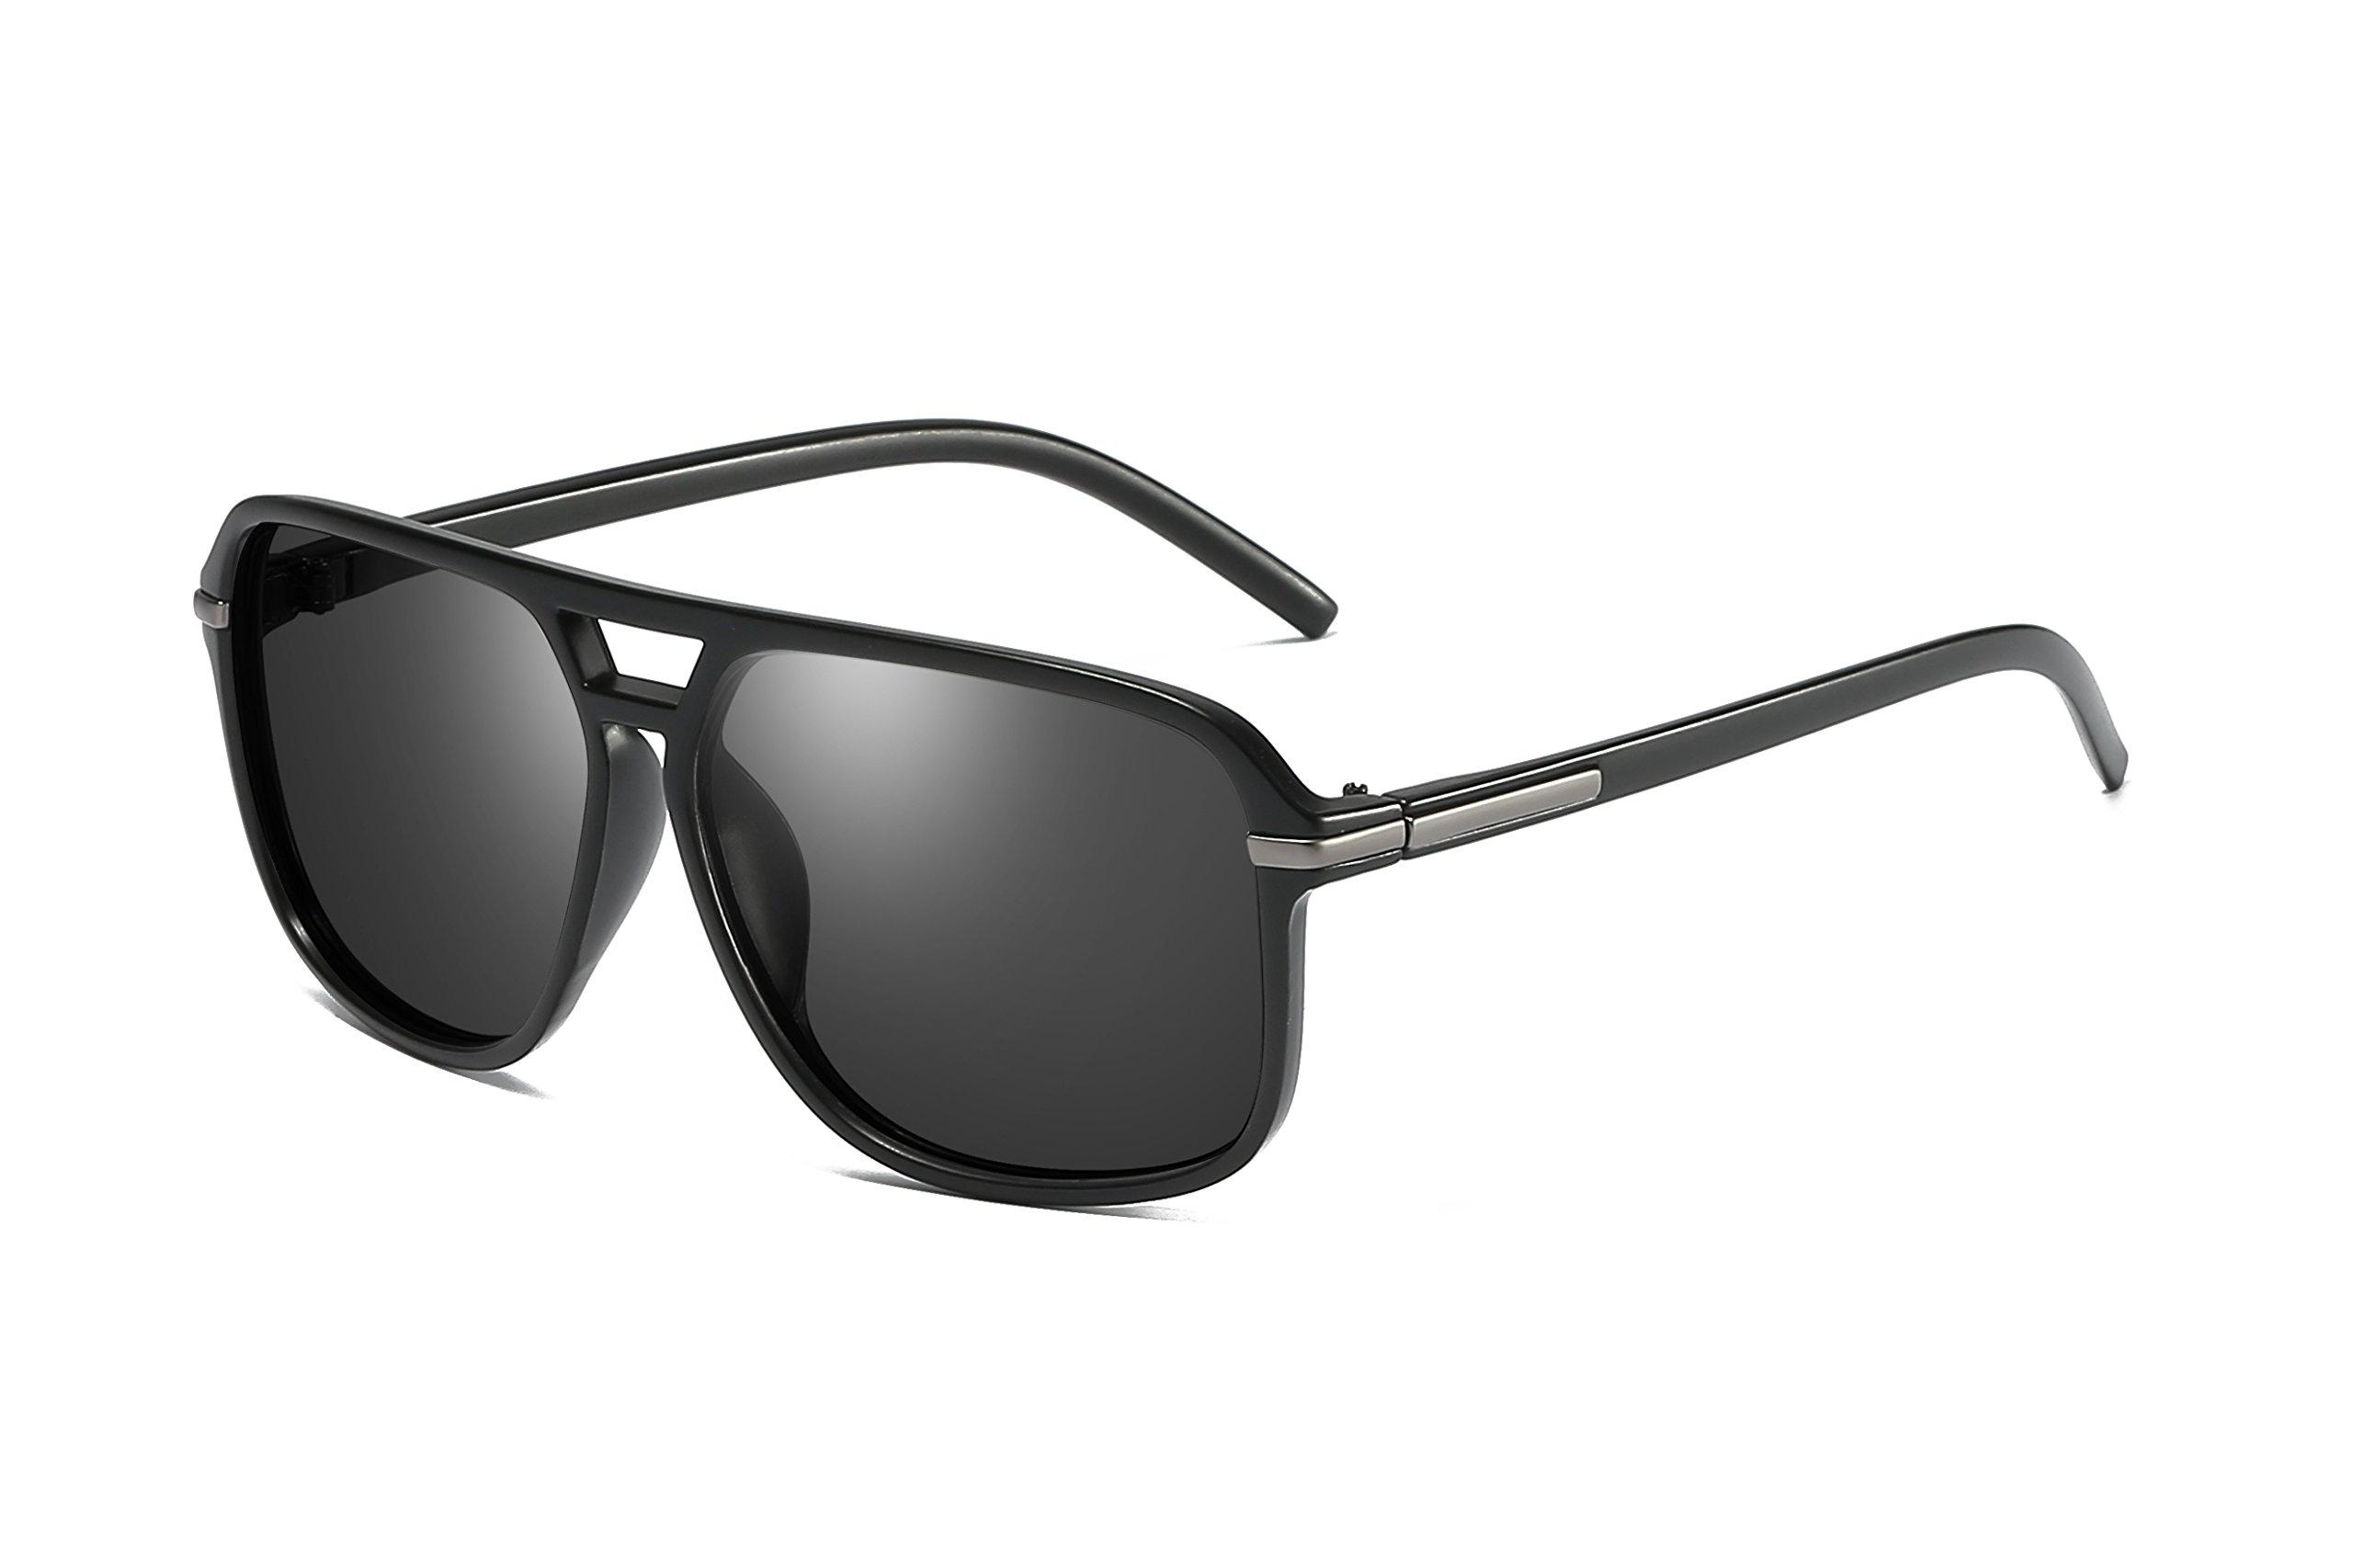 Heptagram Goggle Hot Retro Aviator Polarized Classic Driving Men Sunglasses (Black Frame / Black Lens) by Heptagram